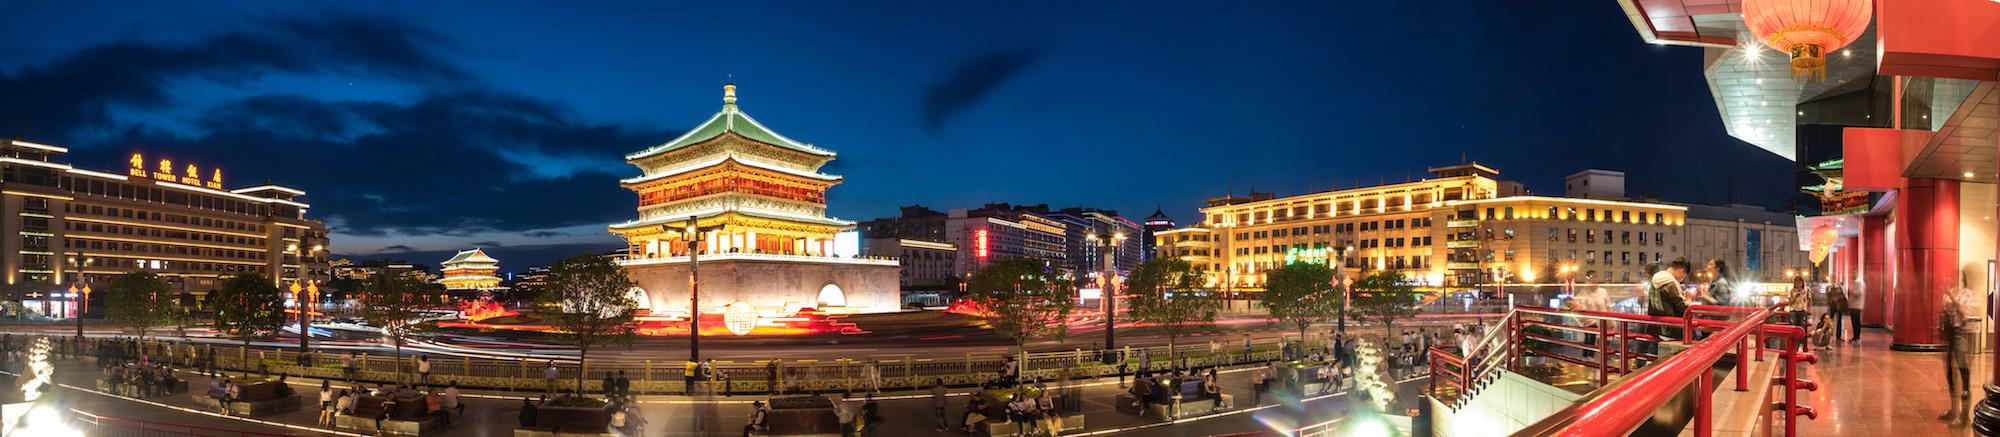 Panorama of Xi'an, China at night